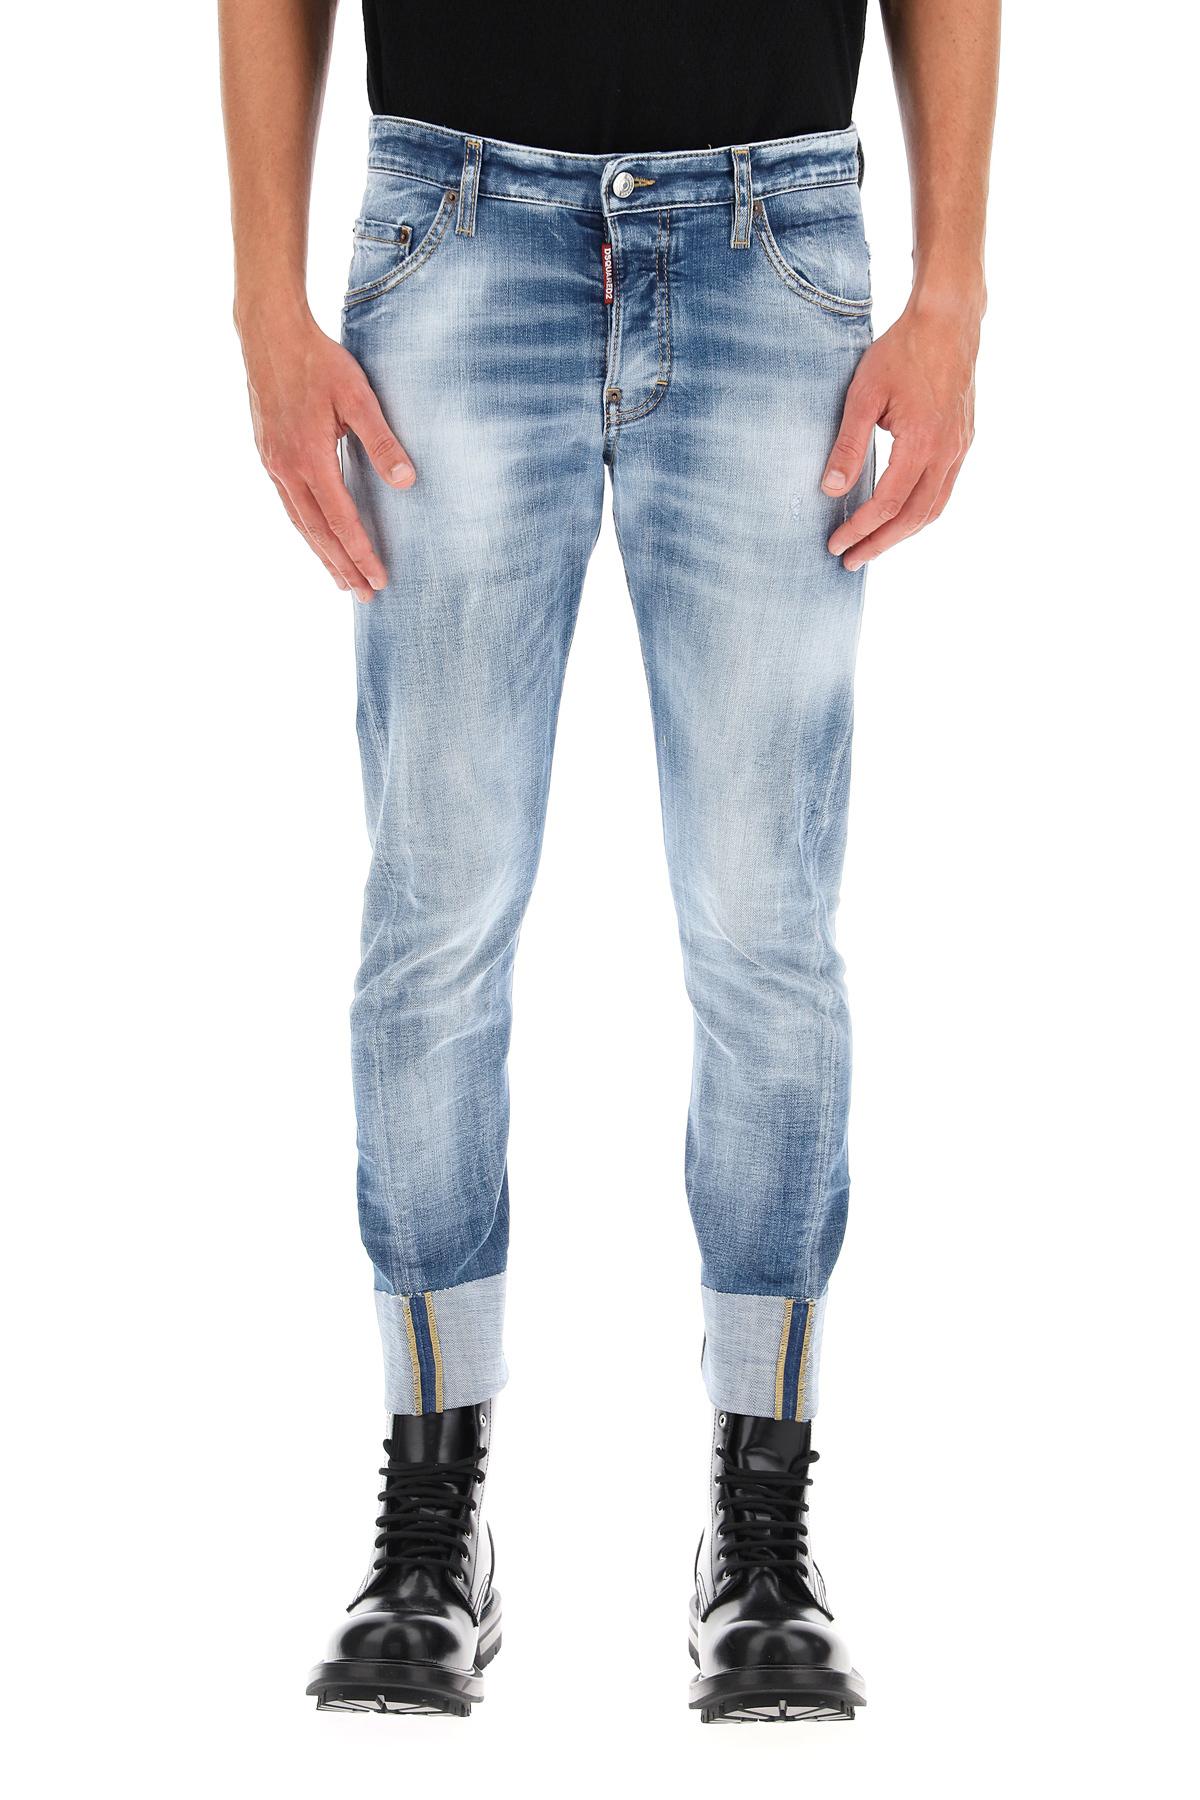 Dsquared2 jeans sexy twist